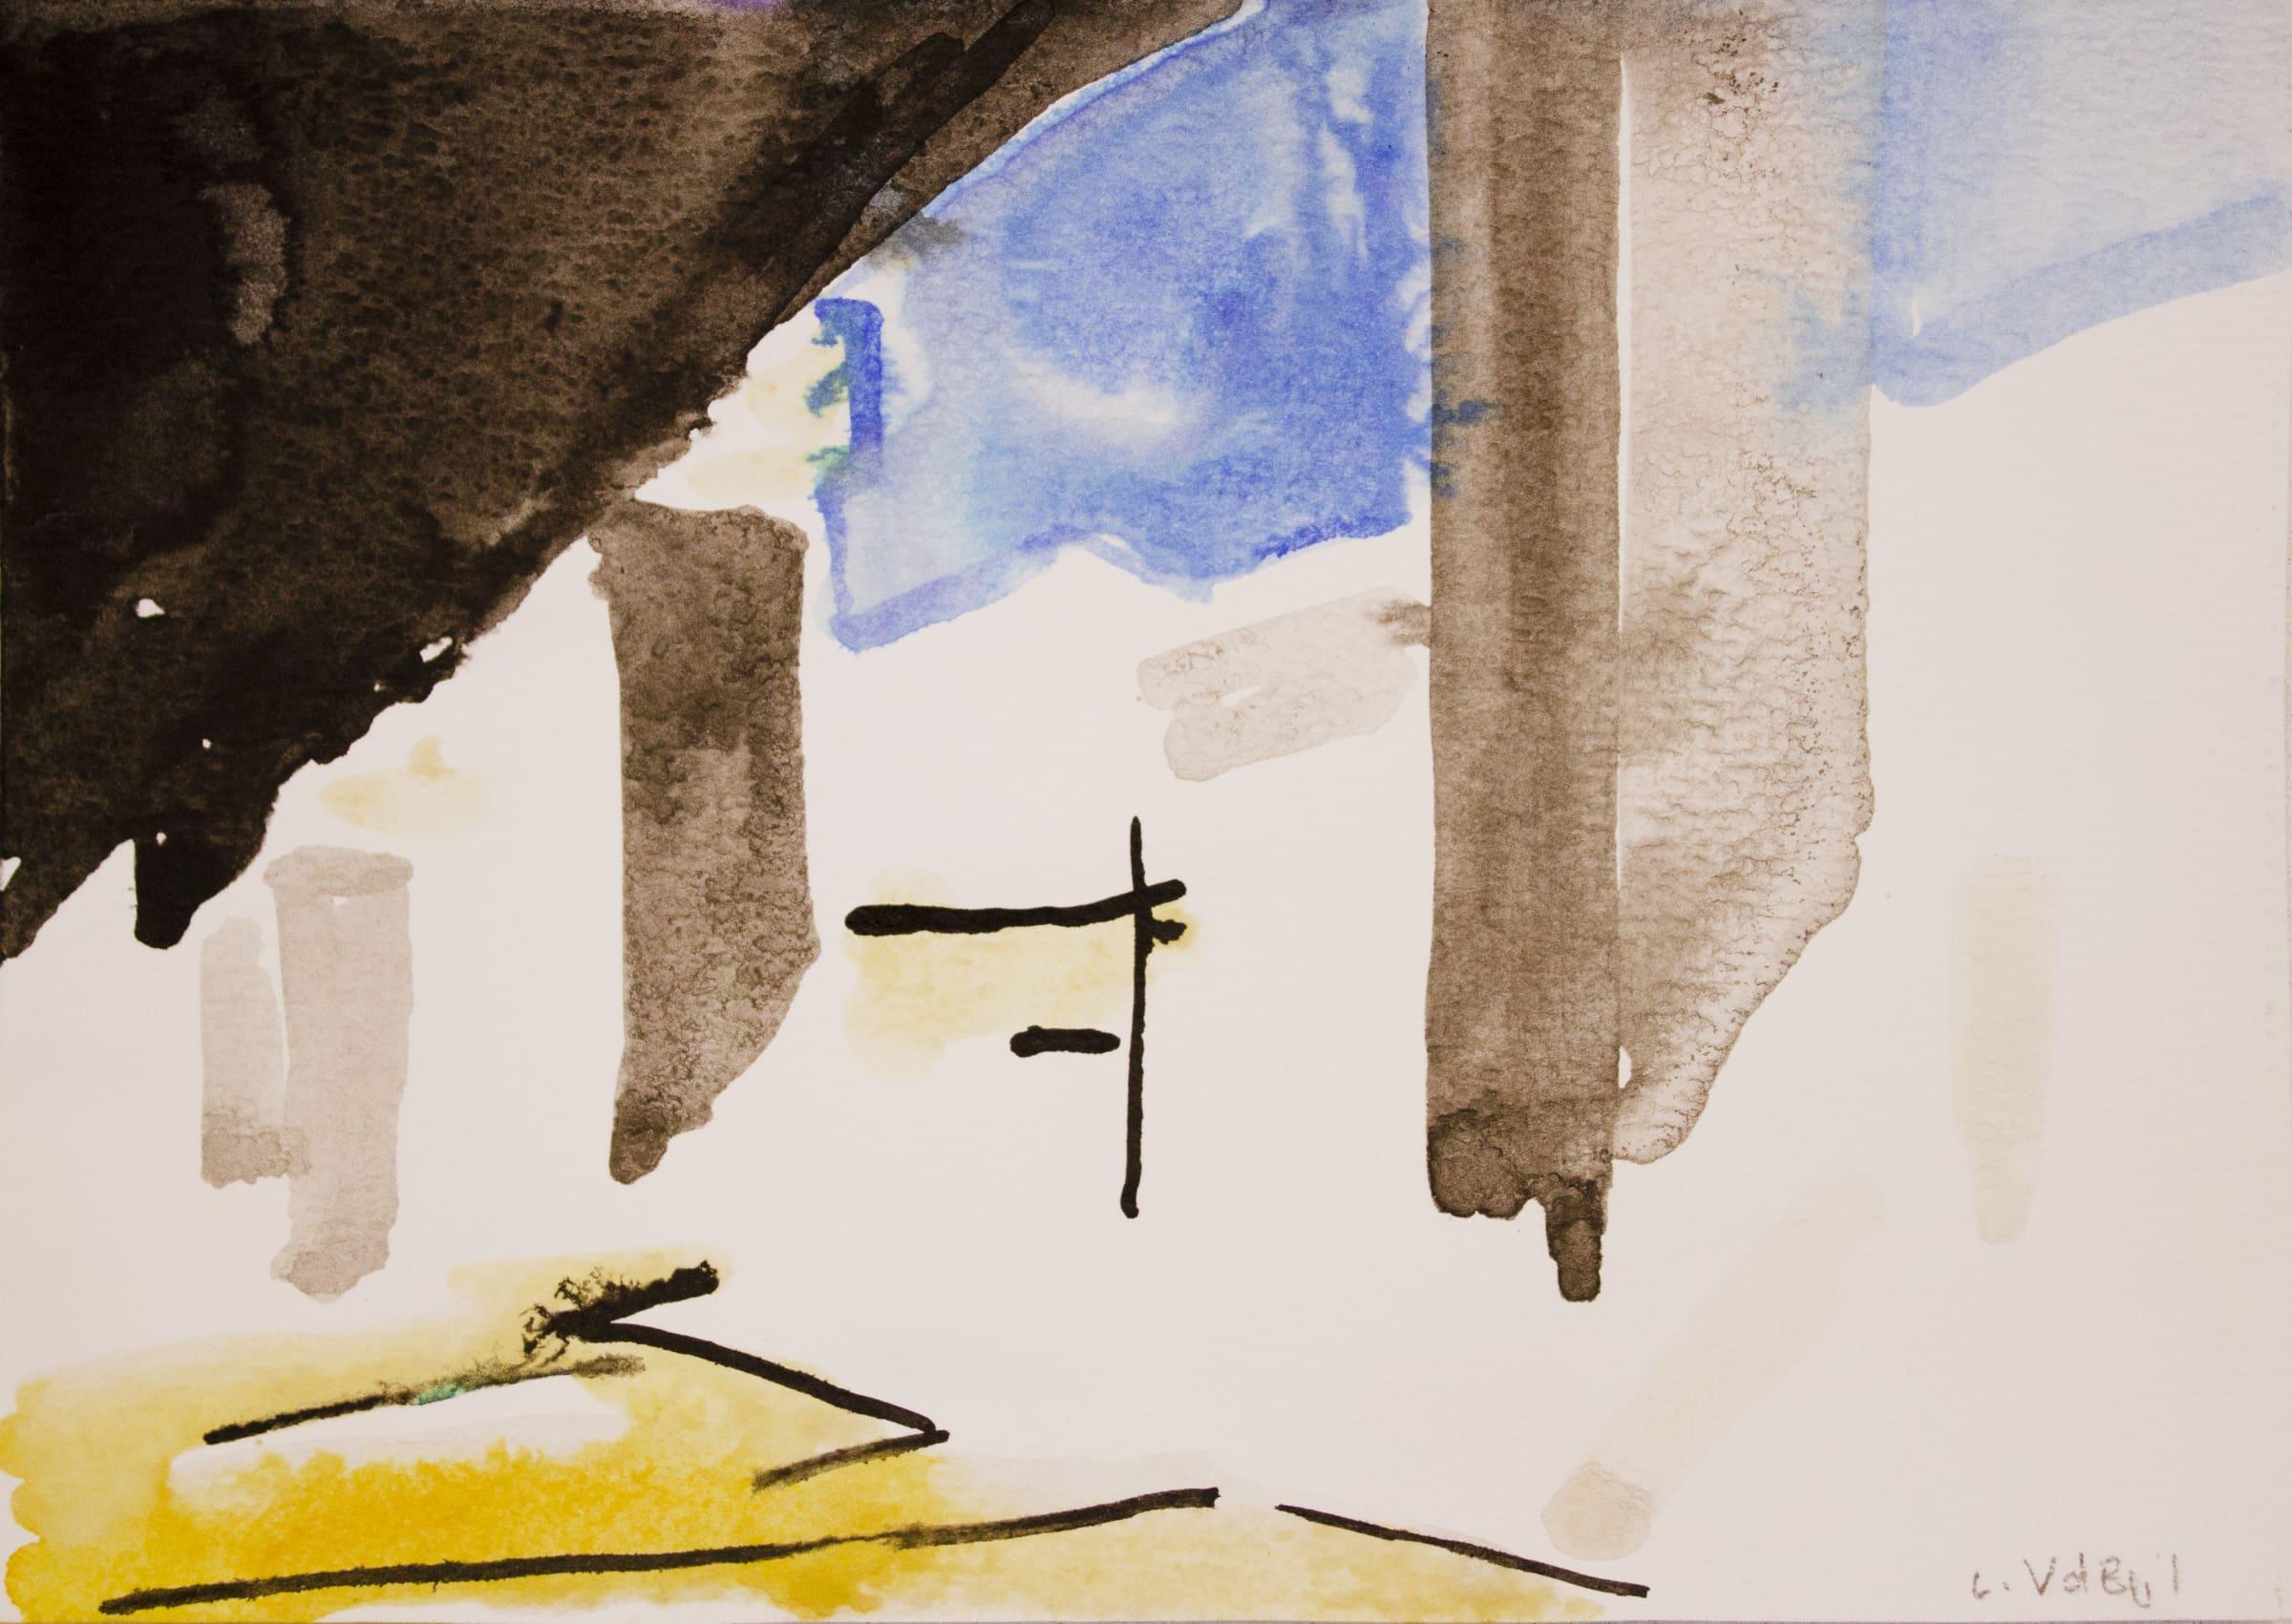 <span class=&#34;link fancybox-details-link&#34;><a href=&#34;/artists/88-louise-van-der-bijl/works/2290-louise-van-der-bijl-inktober-day-27-2018/&#34;>View Detail Page</a></span><div class=&#34;artist&#34;><strong>Louise Van Der Bijl</strong></div> <div class=&#34;title&#34;><em>Inktober Day 27</em>, 2018</div> <div class=&#34;medium&#34;>Ink On Paper</div> <div class=&#34;dimensions&#34;>15cm x 21cm</div><div class=&#34;price&#34;>R400.00</div>